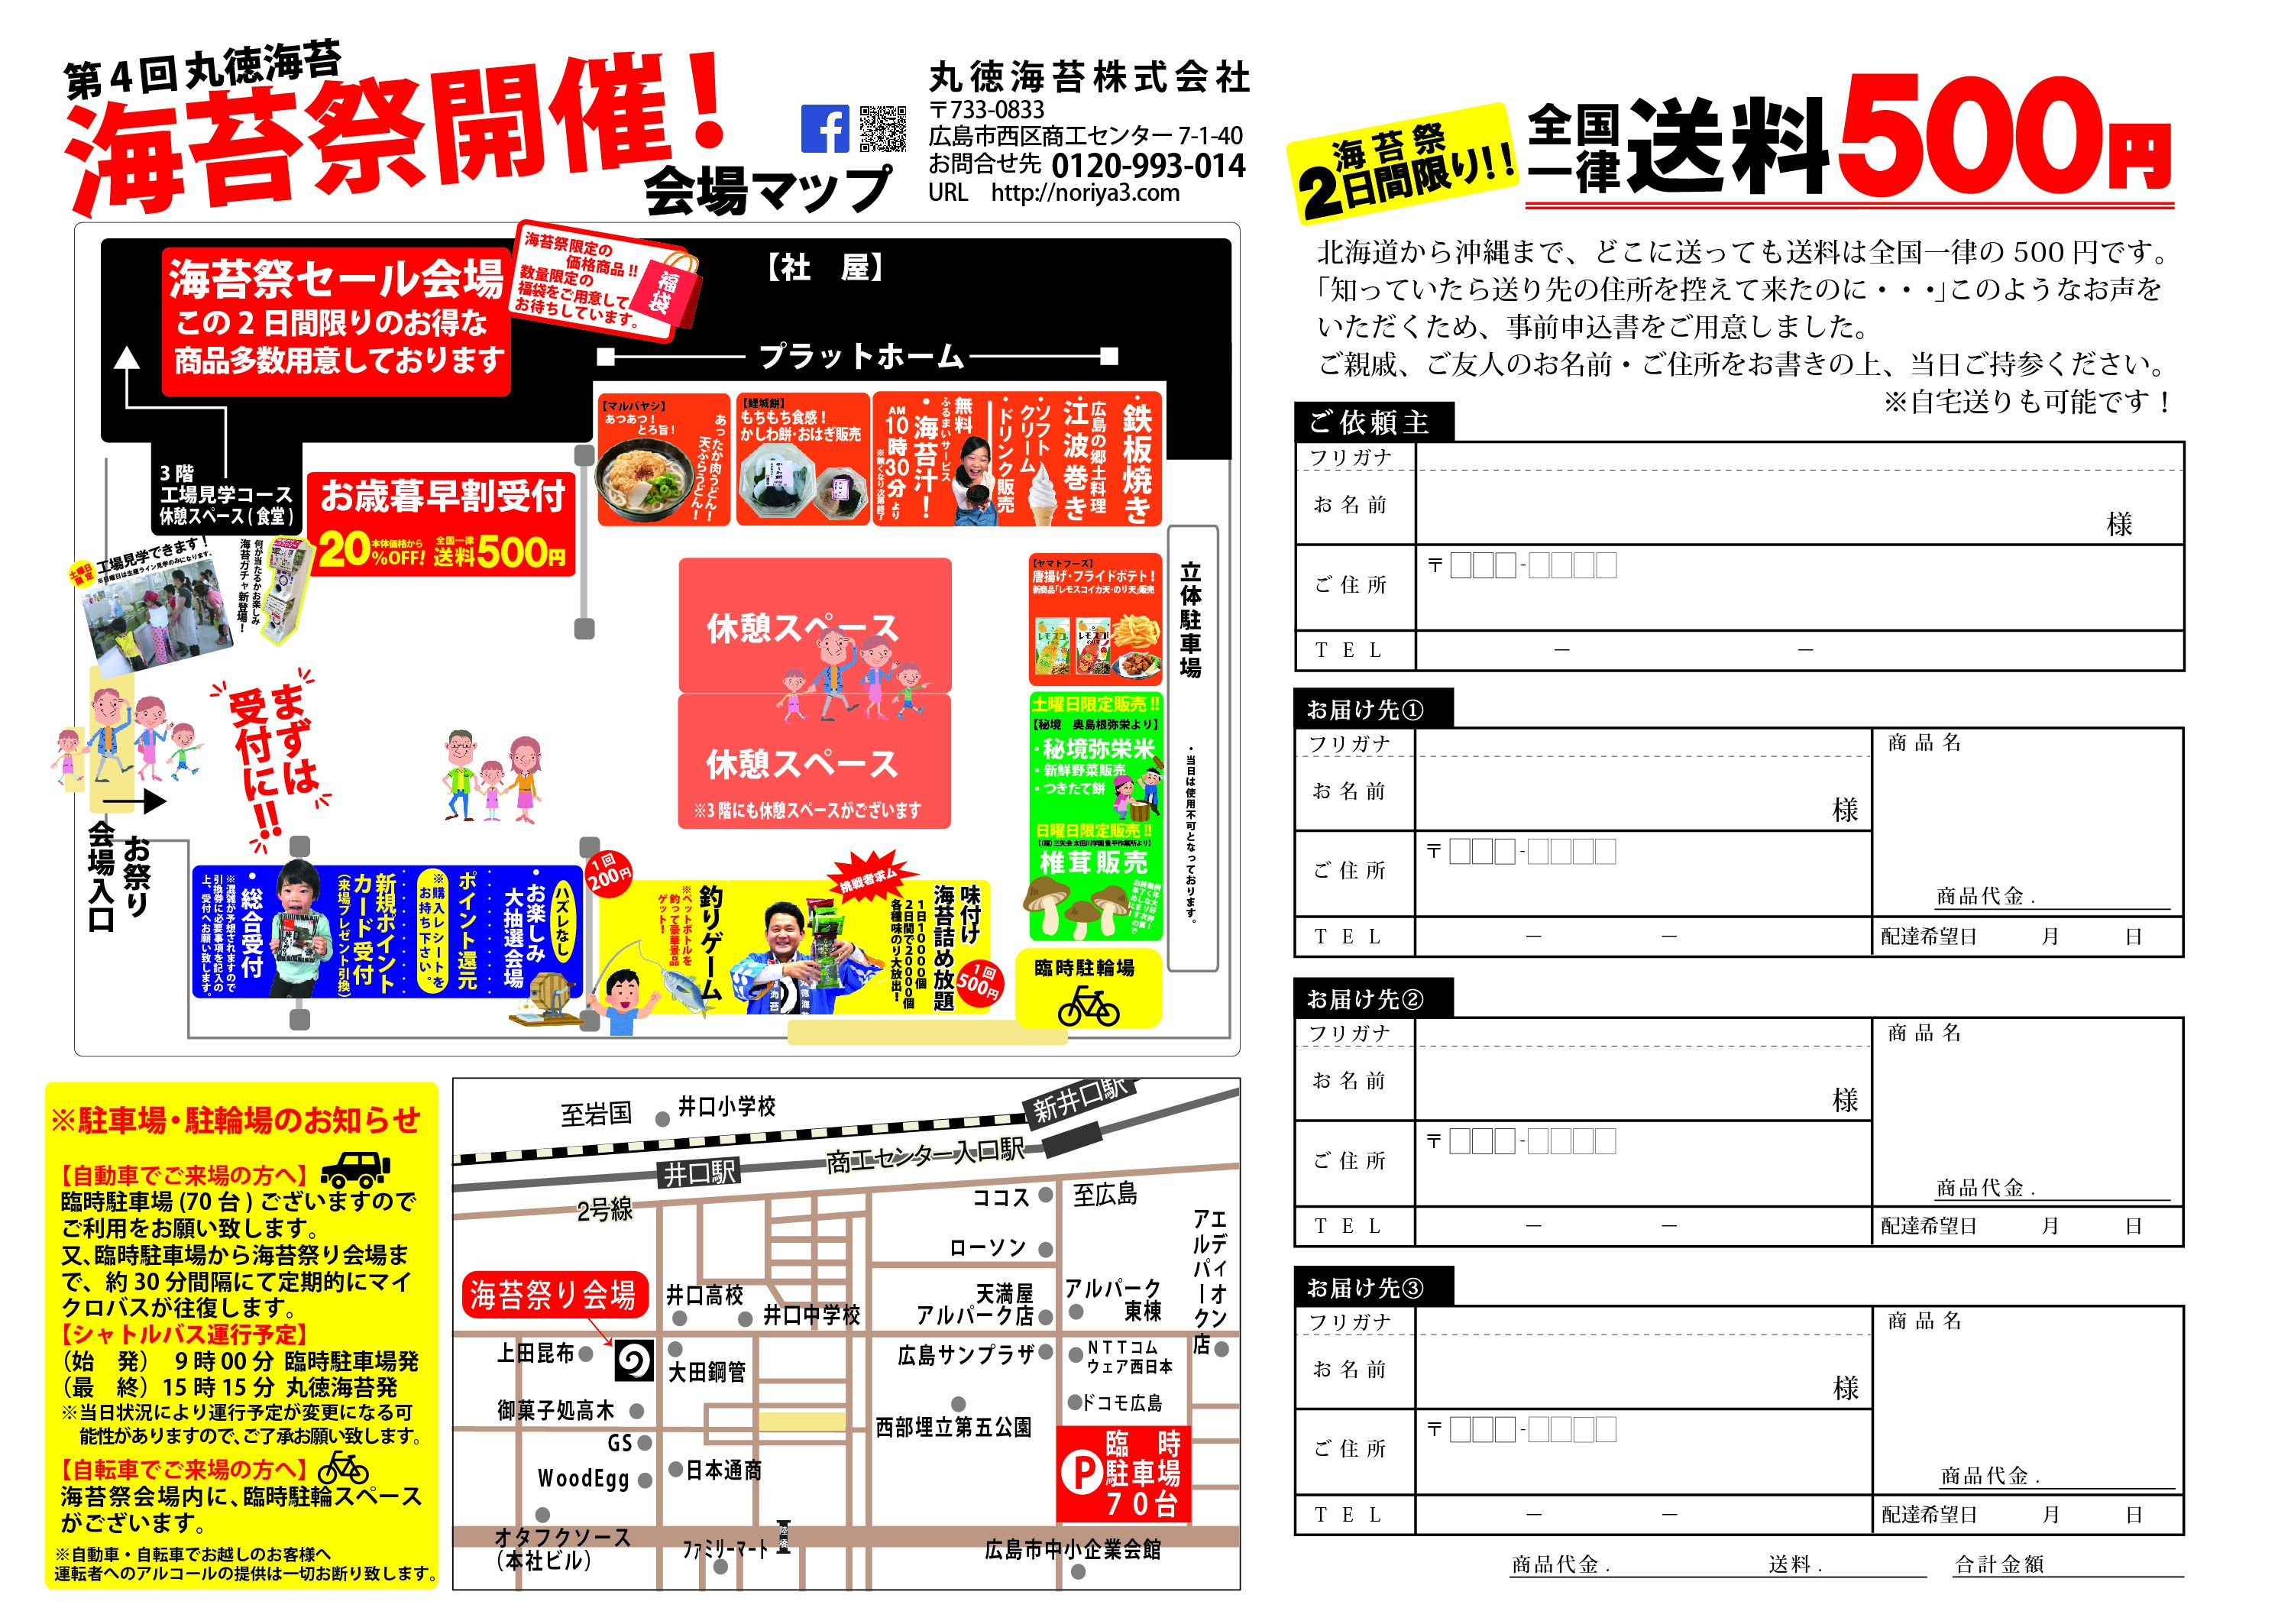 http://marutokunori.jp/news/%E7%AC%AC4%E5%9B%9E%E7%A7%8B%E3%81%AE%E6%B5%B7%E8%8B%94%E7%A5%AD%E3%82%8A_%E6%89%8B%E9%85%8DA3-02.jpg